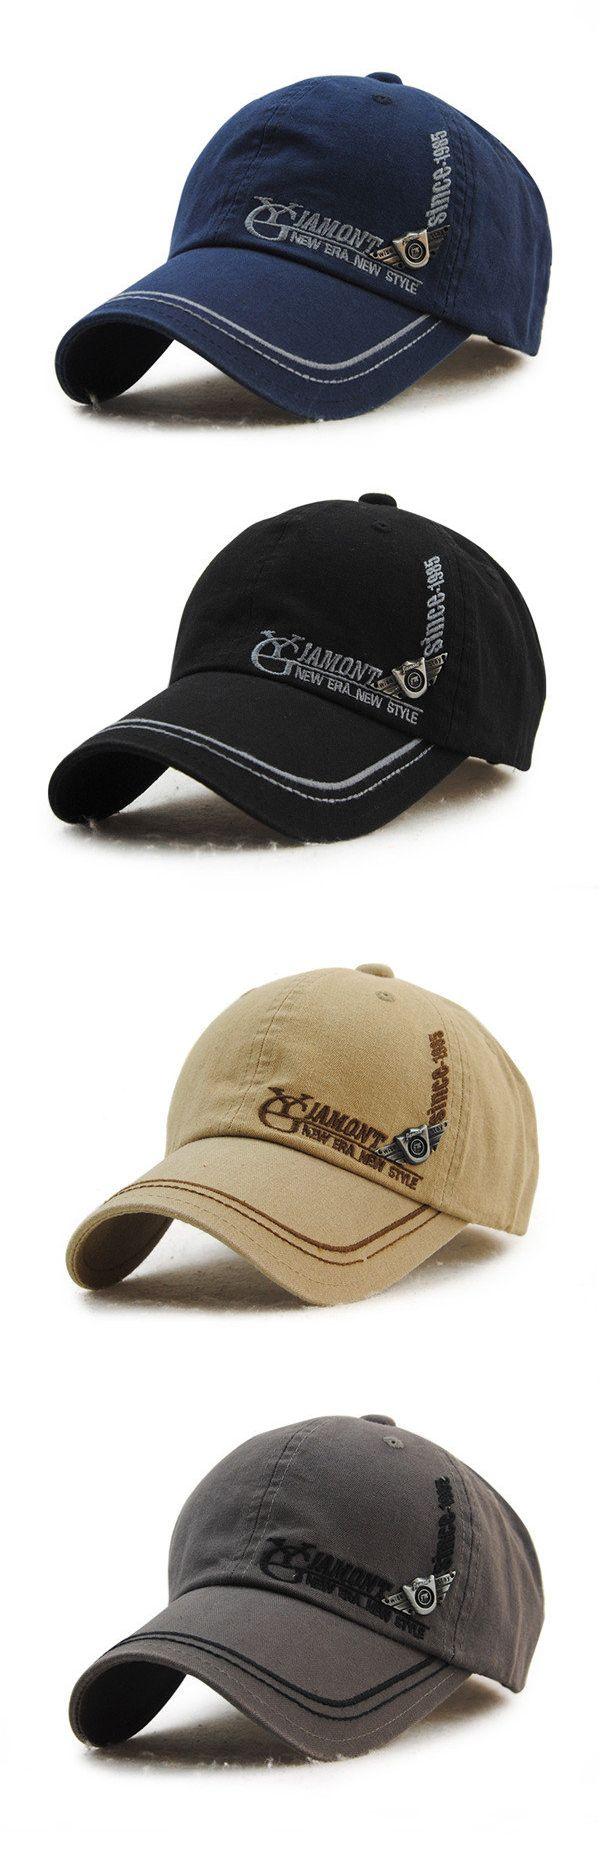 #Letter Baseball Cap #Leisure Outdoor Golf Snapback Hat